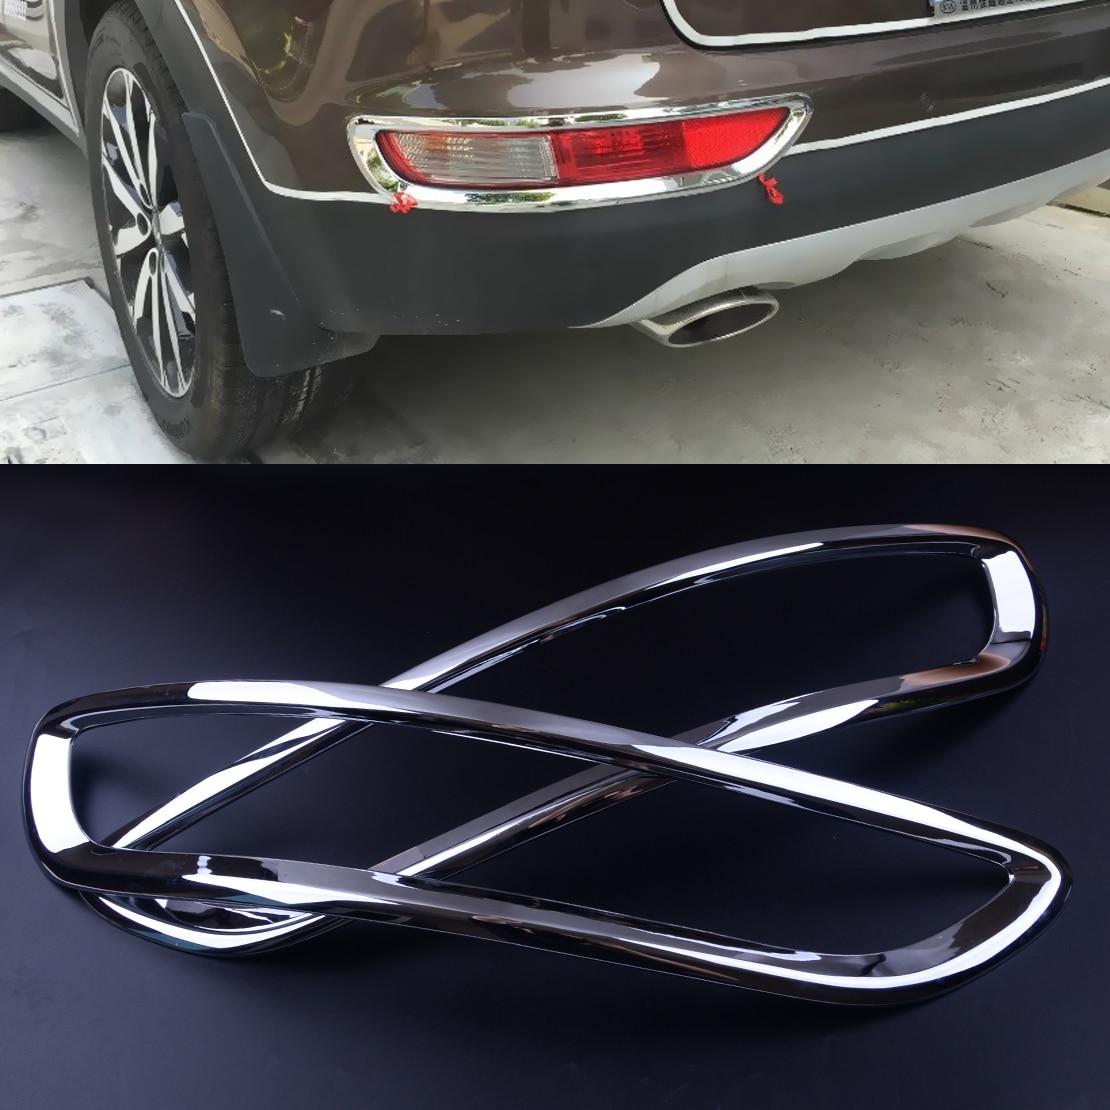 CITALL 2pcs Silver Chrome Rear Reflector Fog Light font b Lamp b font Cover Trim Fit